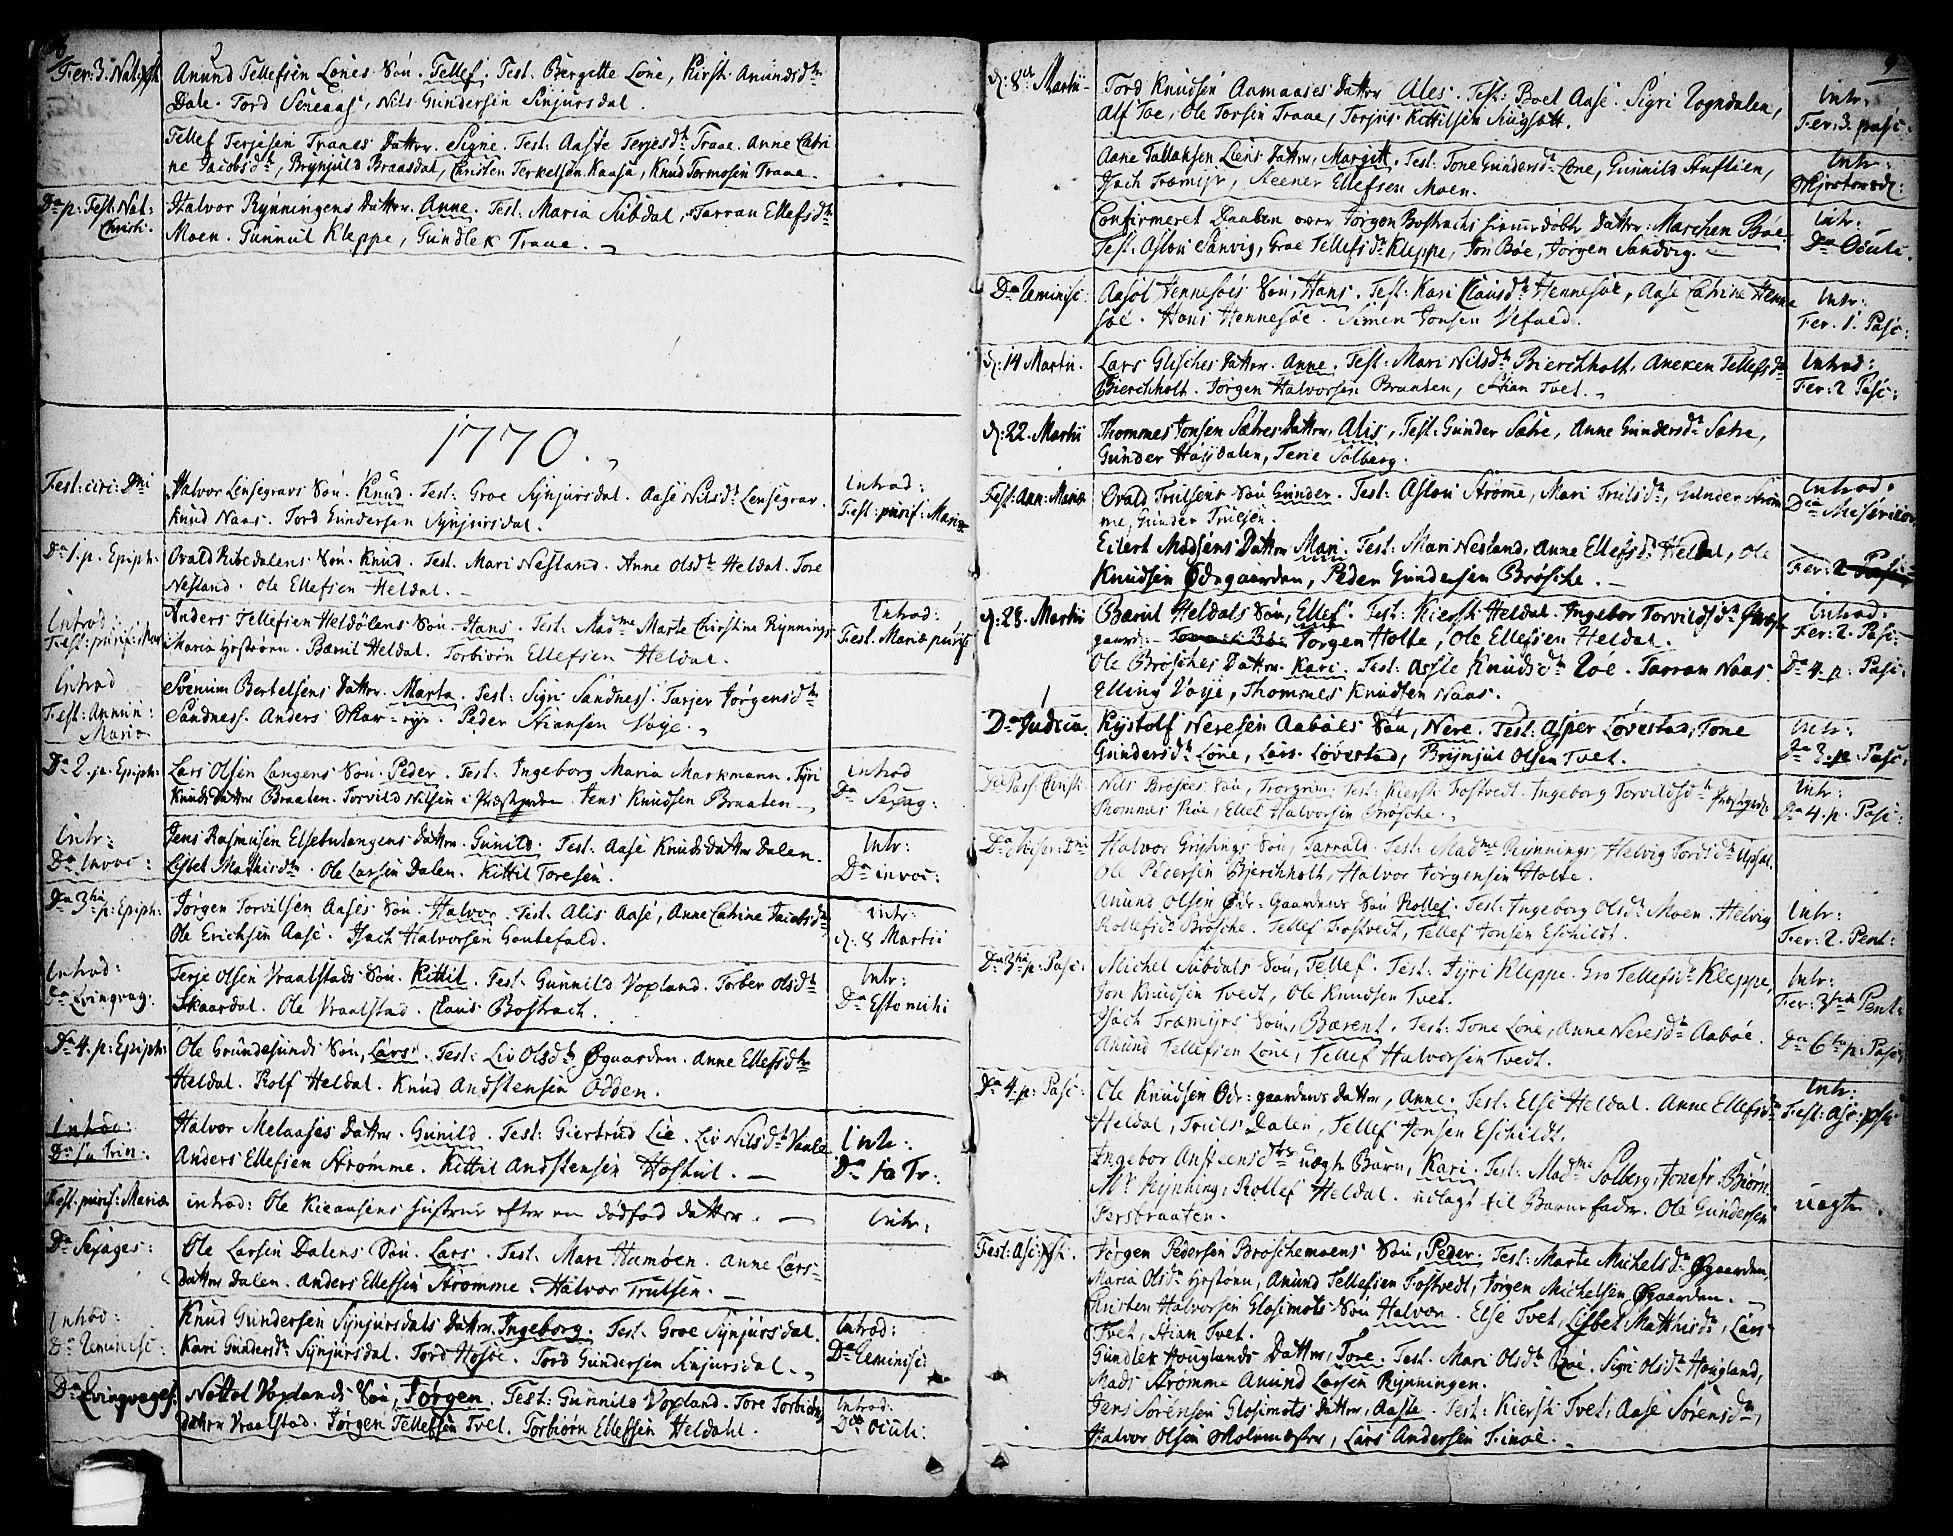 SAKO, Drangedal kirkebøker, F/Fa/L0003: Ministerialbok nr. 3, 1768-1814, s. 8-9